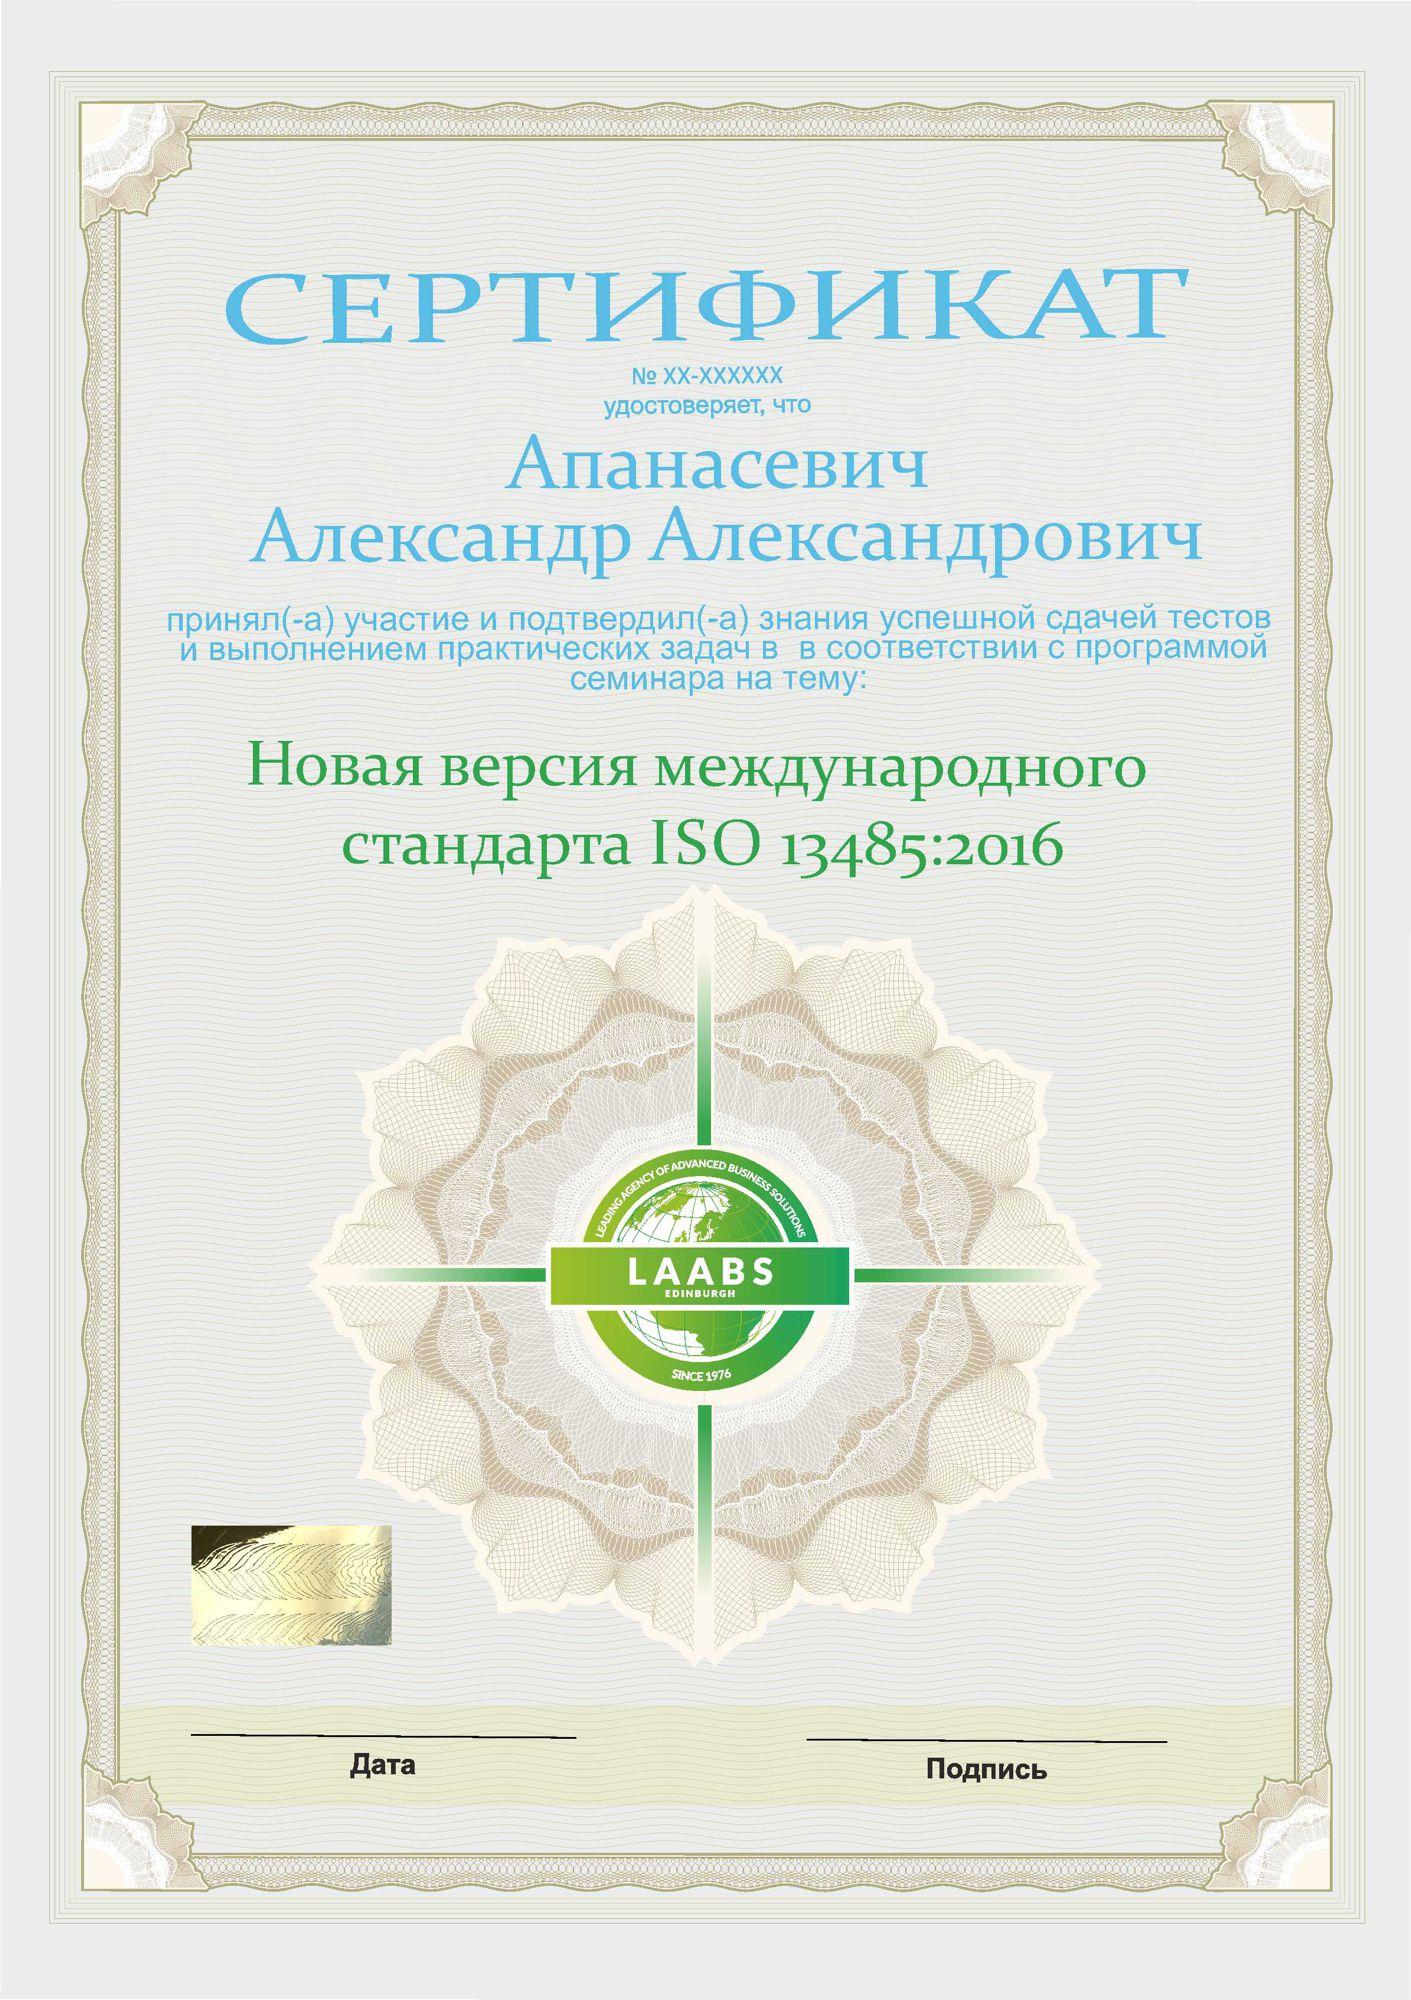 Необходимо разработать дизайн 3 сертификатов фото f_257587b26b71be61.jpg